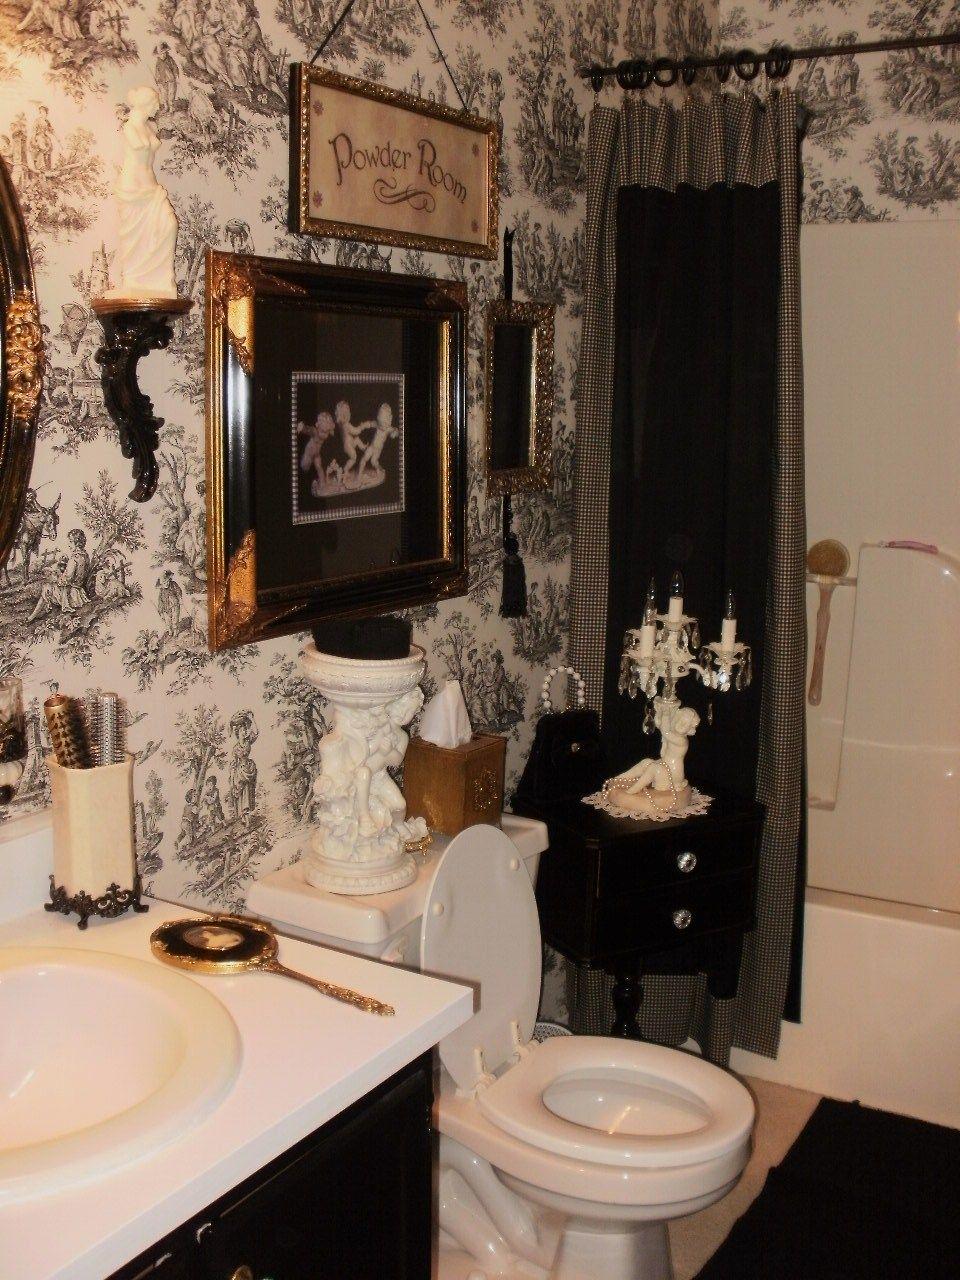 ideas for bathrooms decorating%0A My friend Laura u    s beautiful toile bathroom